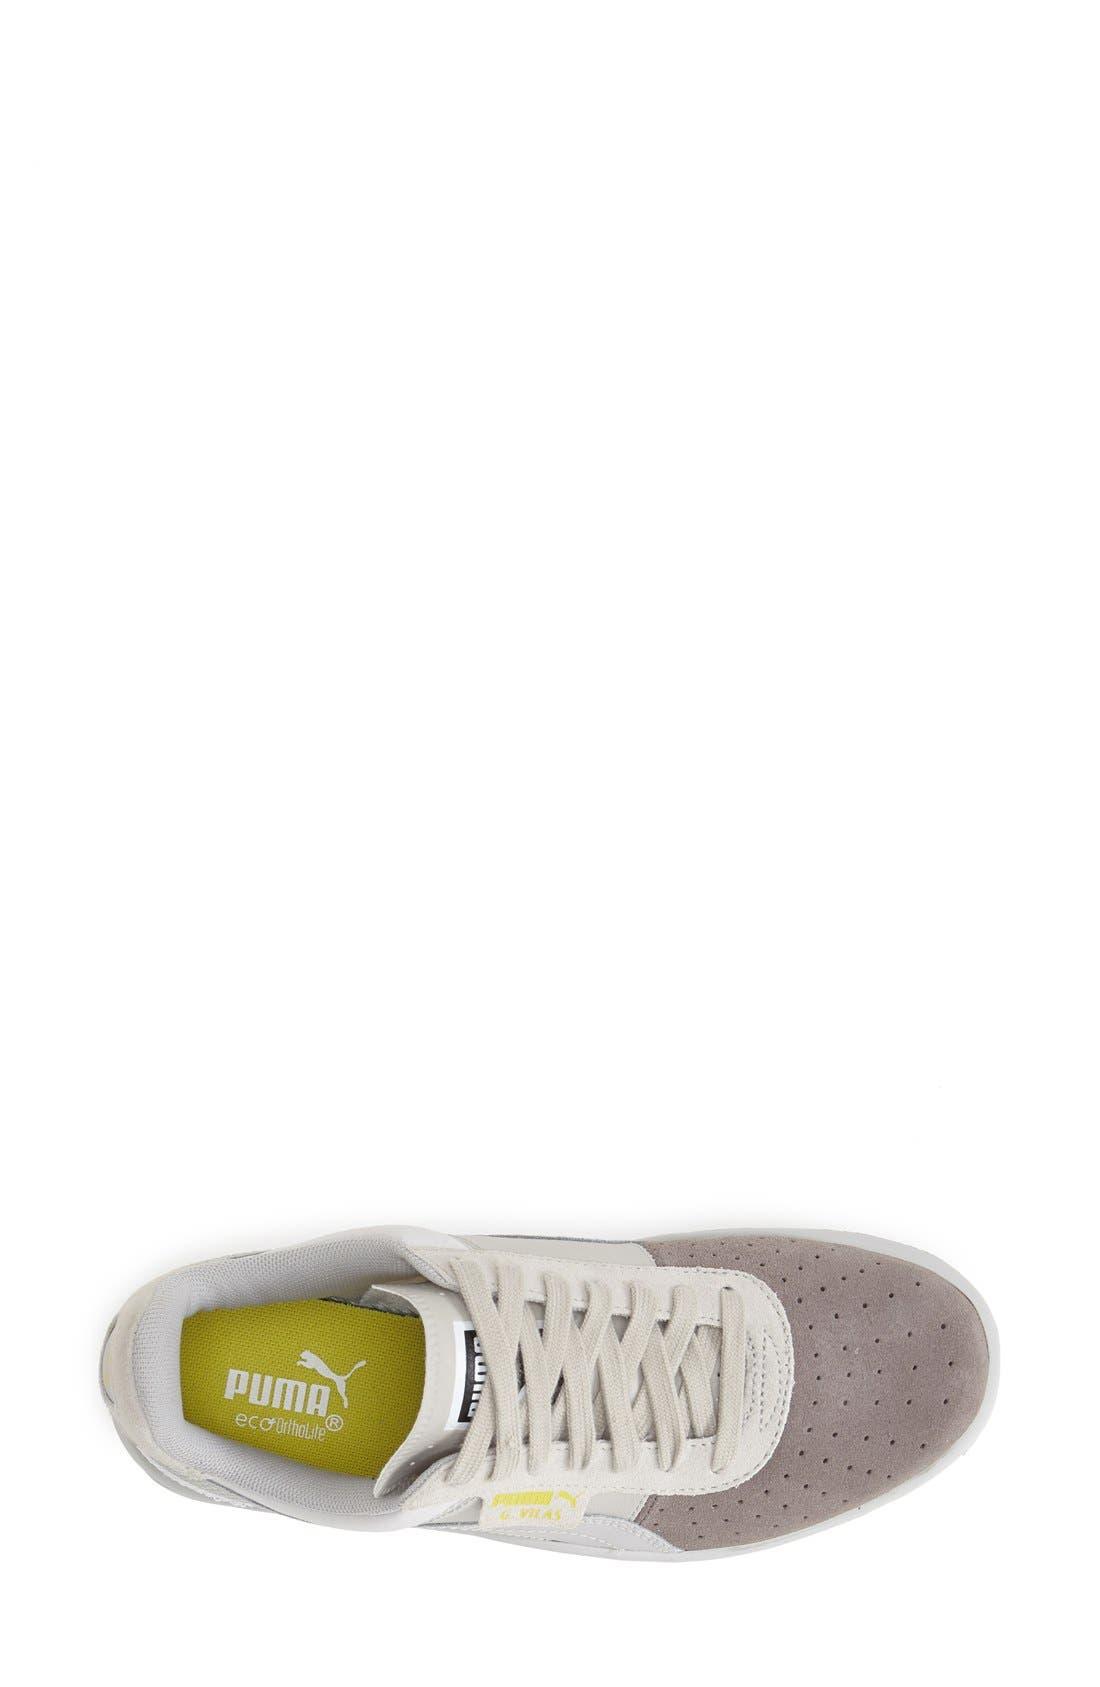 Alternate Image 3  - PUMA 'G. Vilas - Blocks and Stripes' Sneaker (Women)